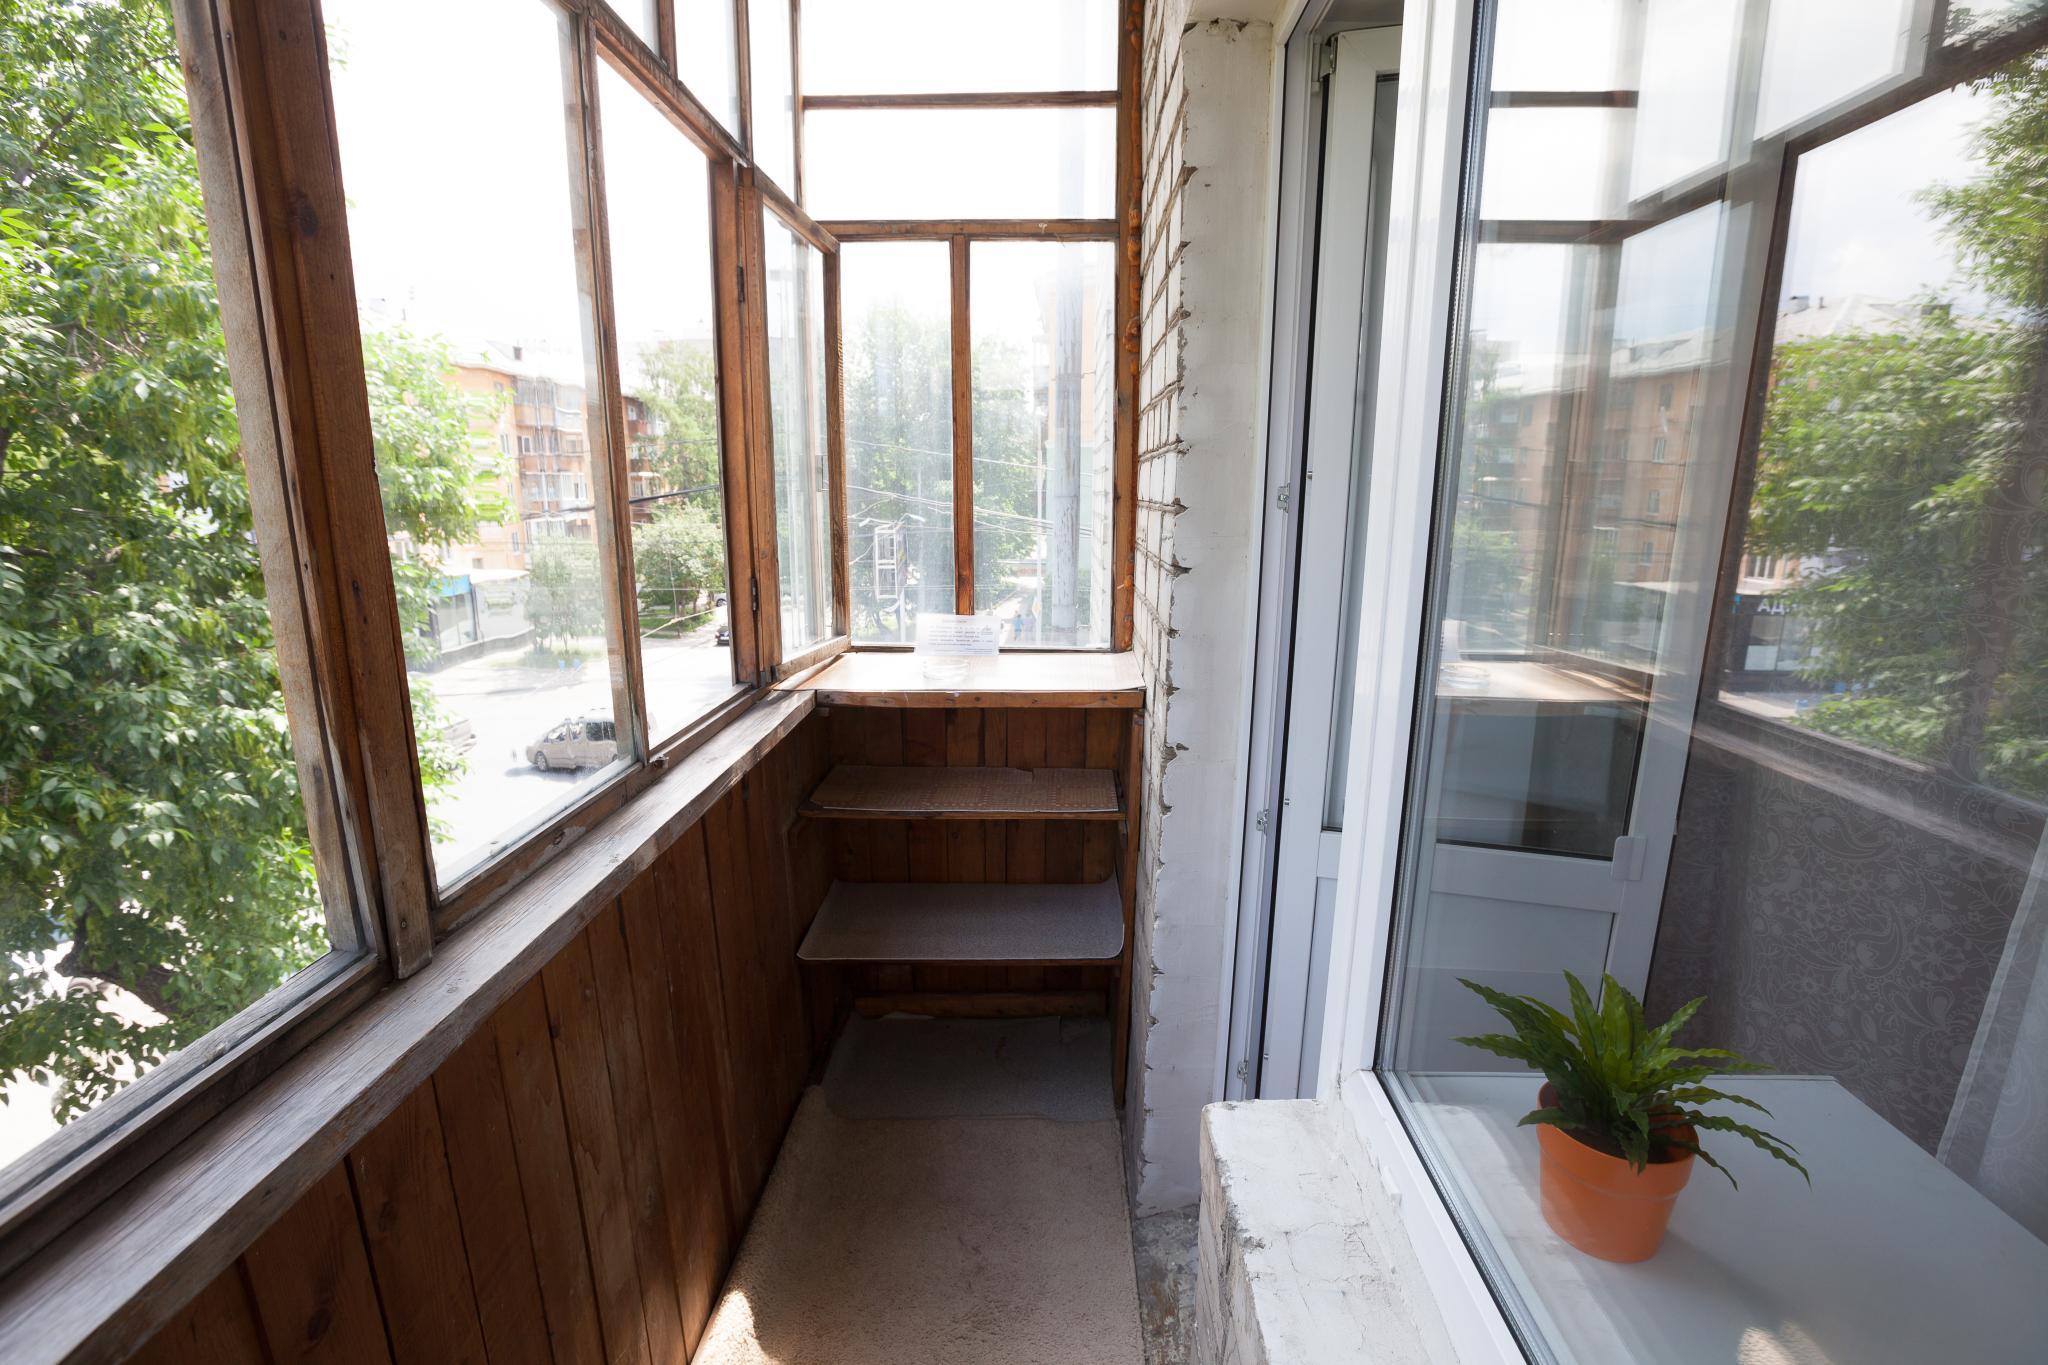 Квартира посуточно на ул малышева, 87 (екатеринбург) - снять.